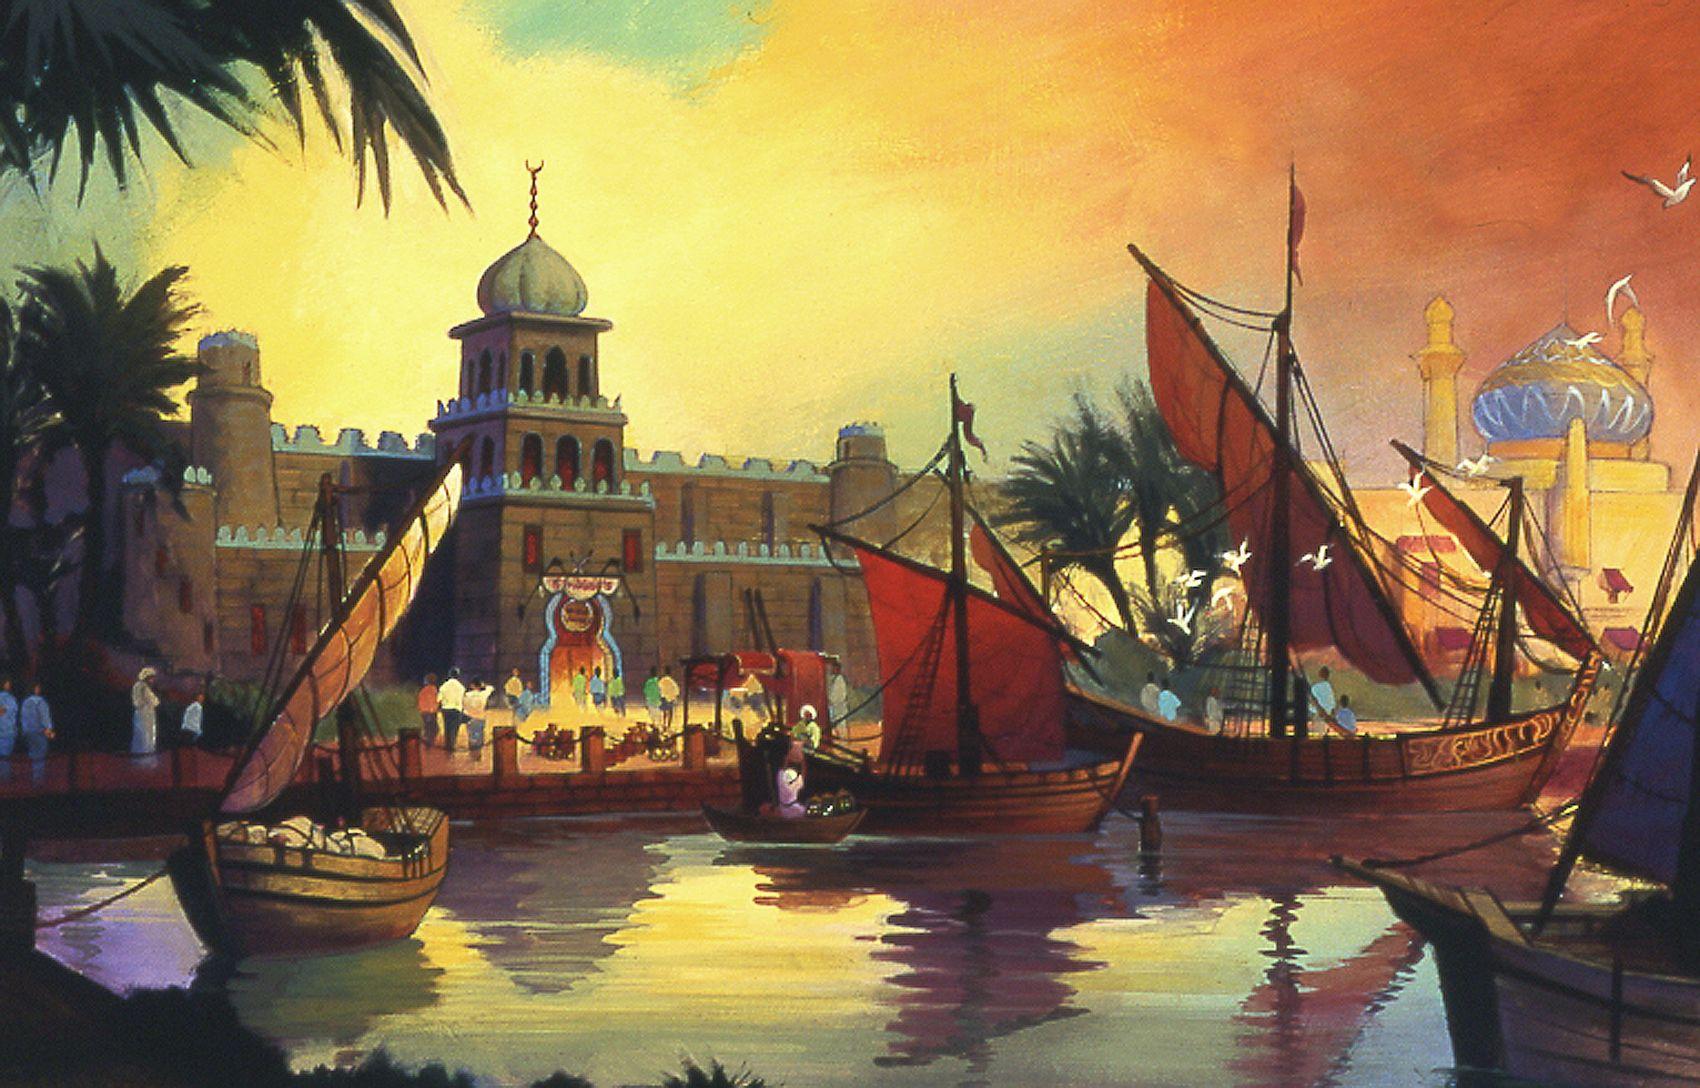 concept art, arabian coast, tokyo disney sea artist: phillip freer